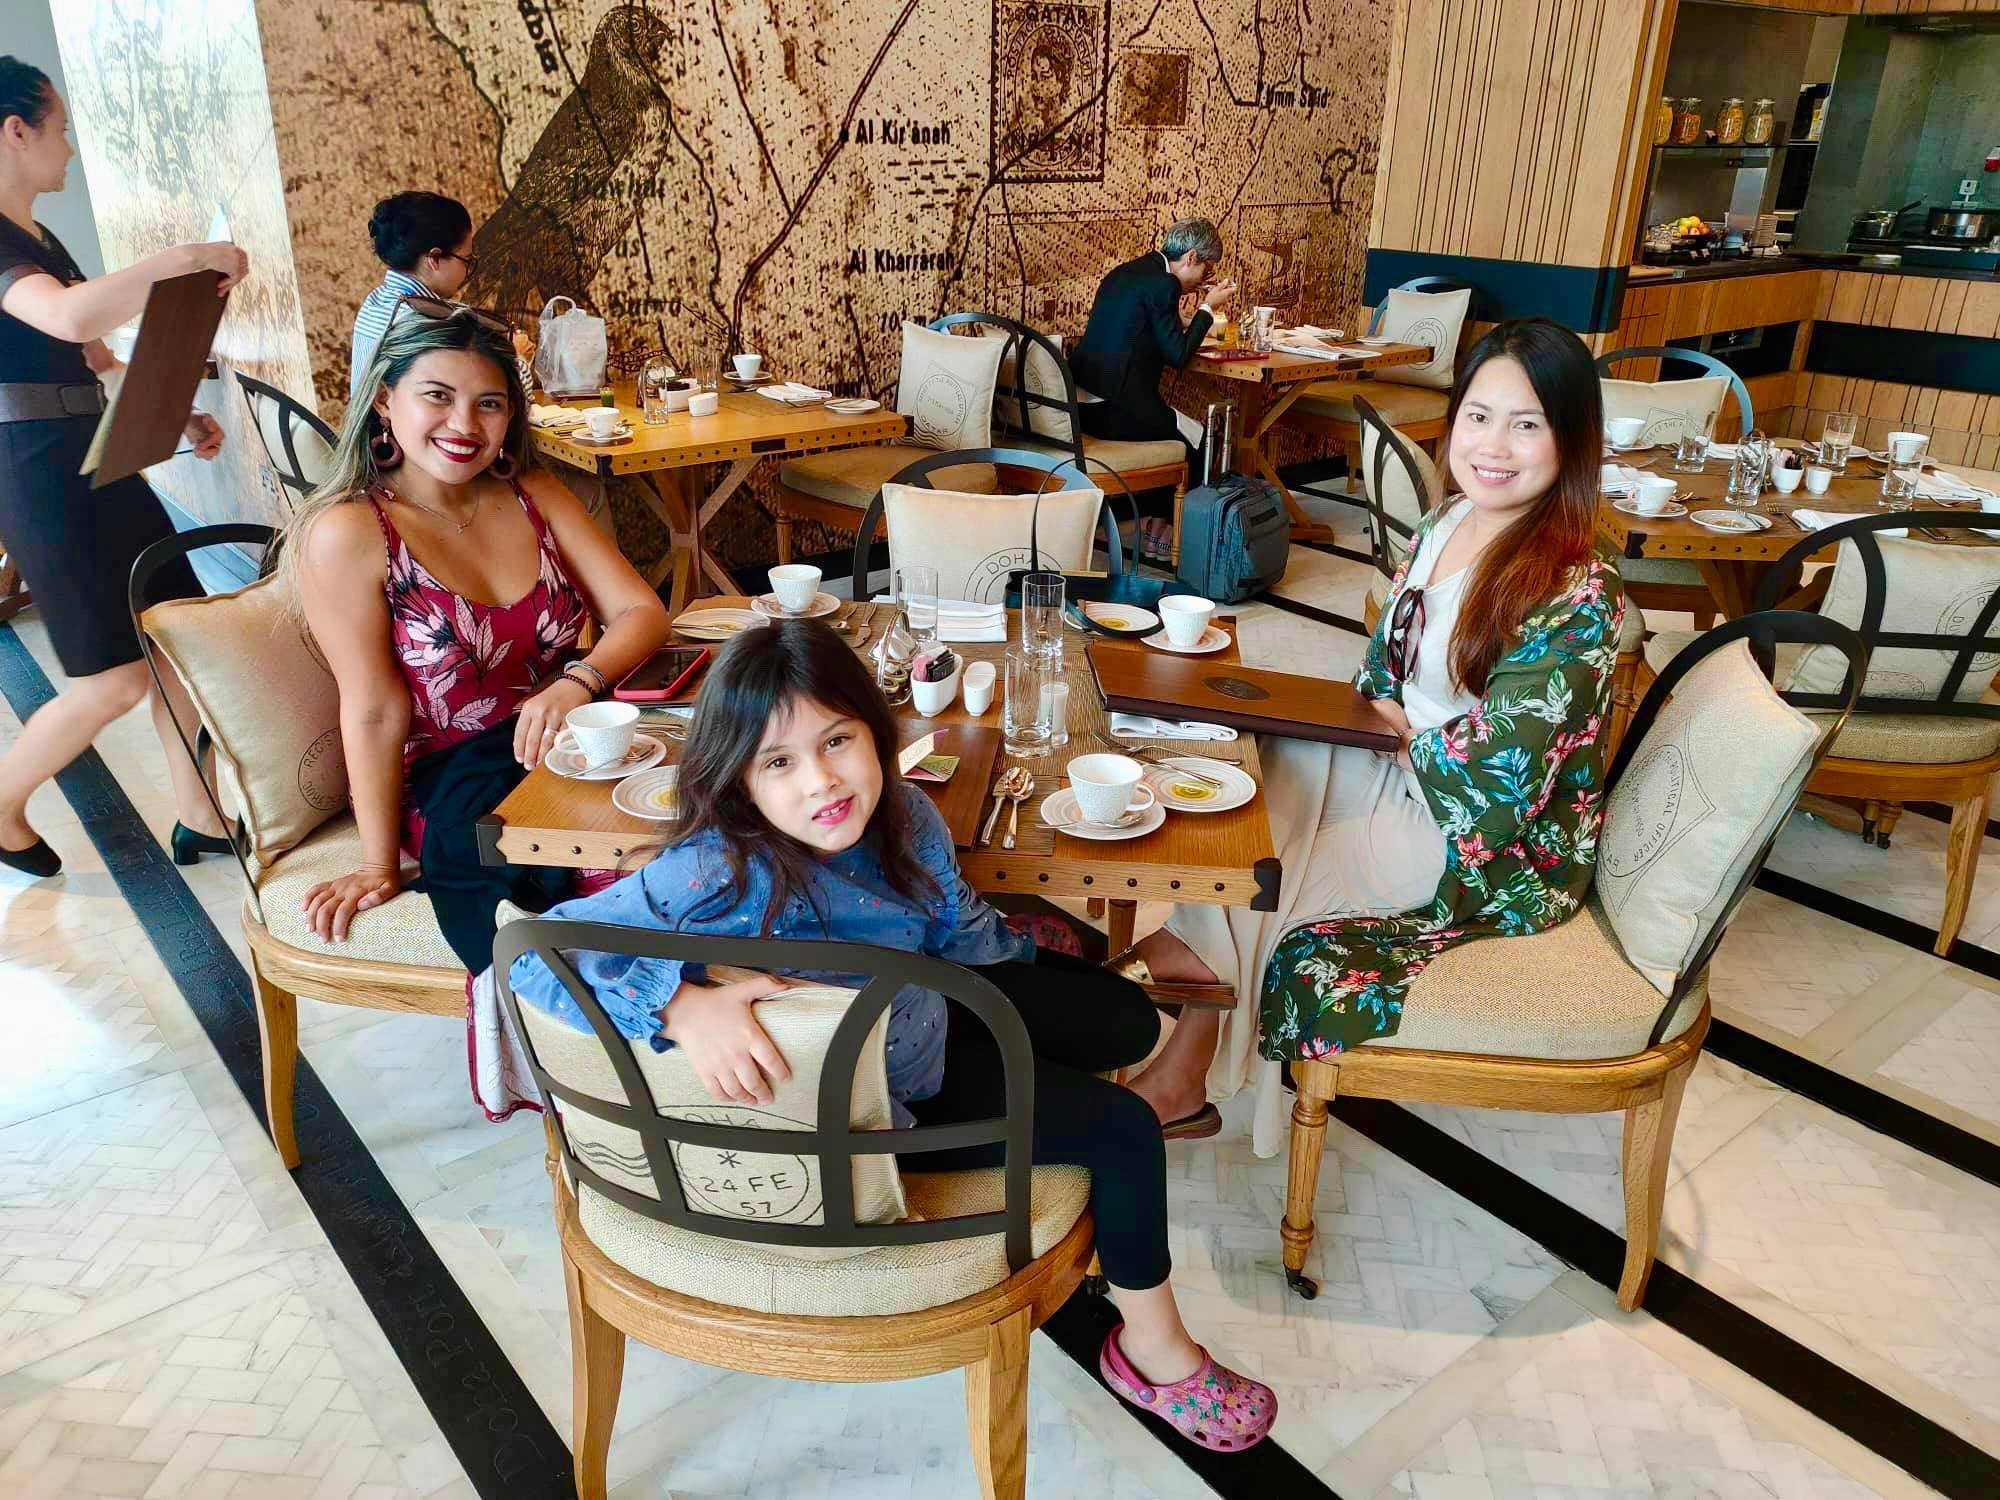 Kach Solo Travels in 2019 I did a 20-hour layover in Doha, QATAR7.jpg